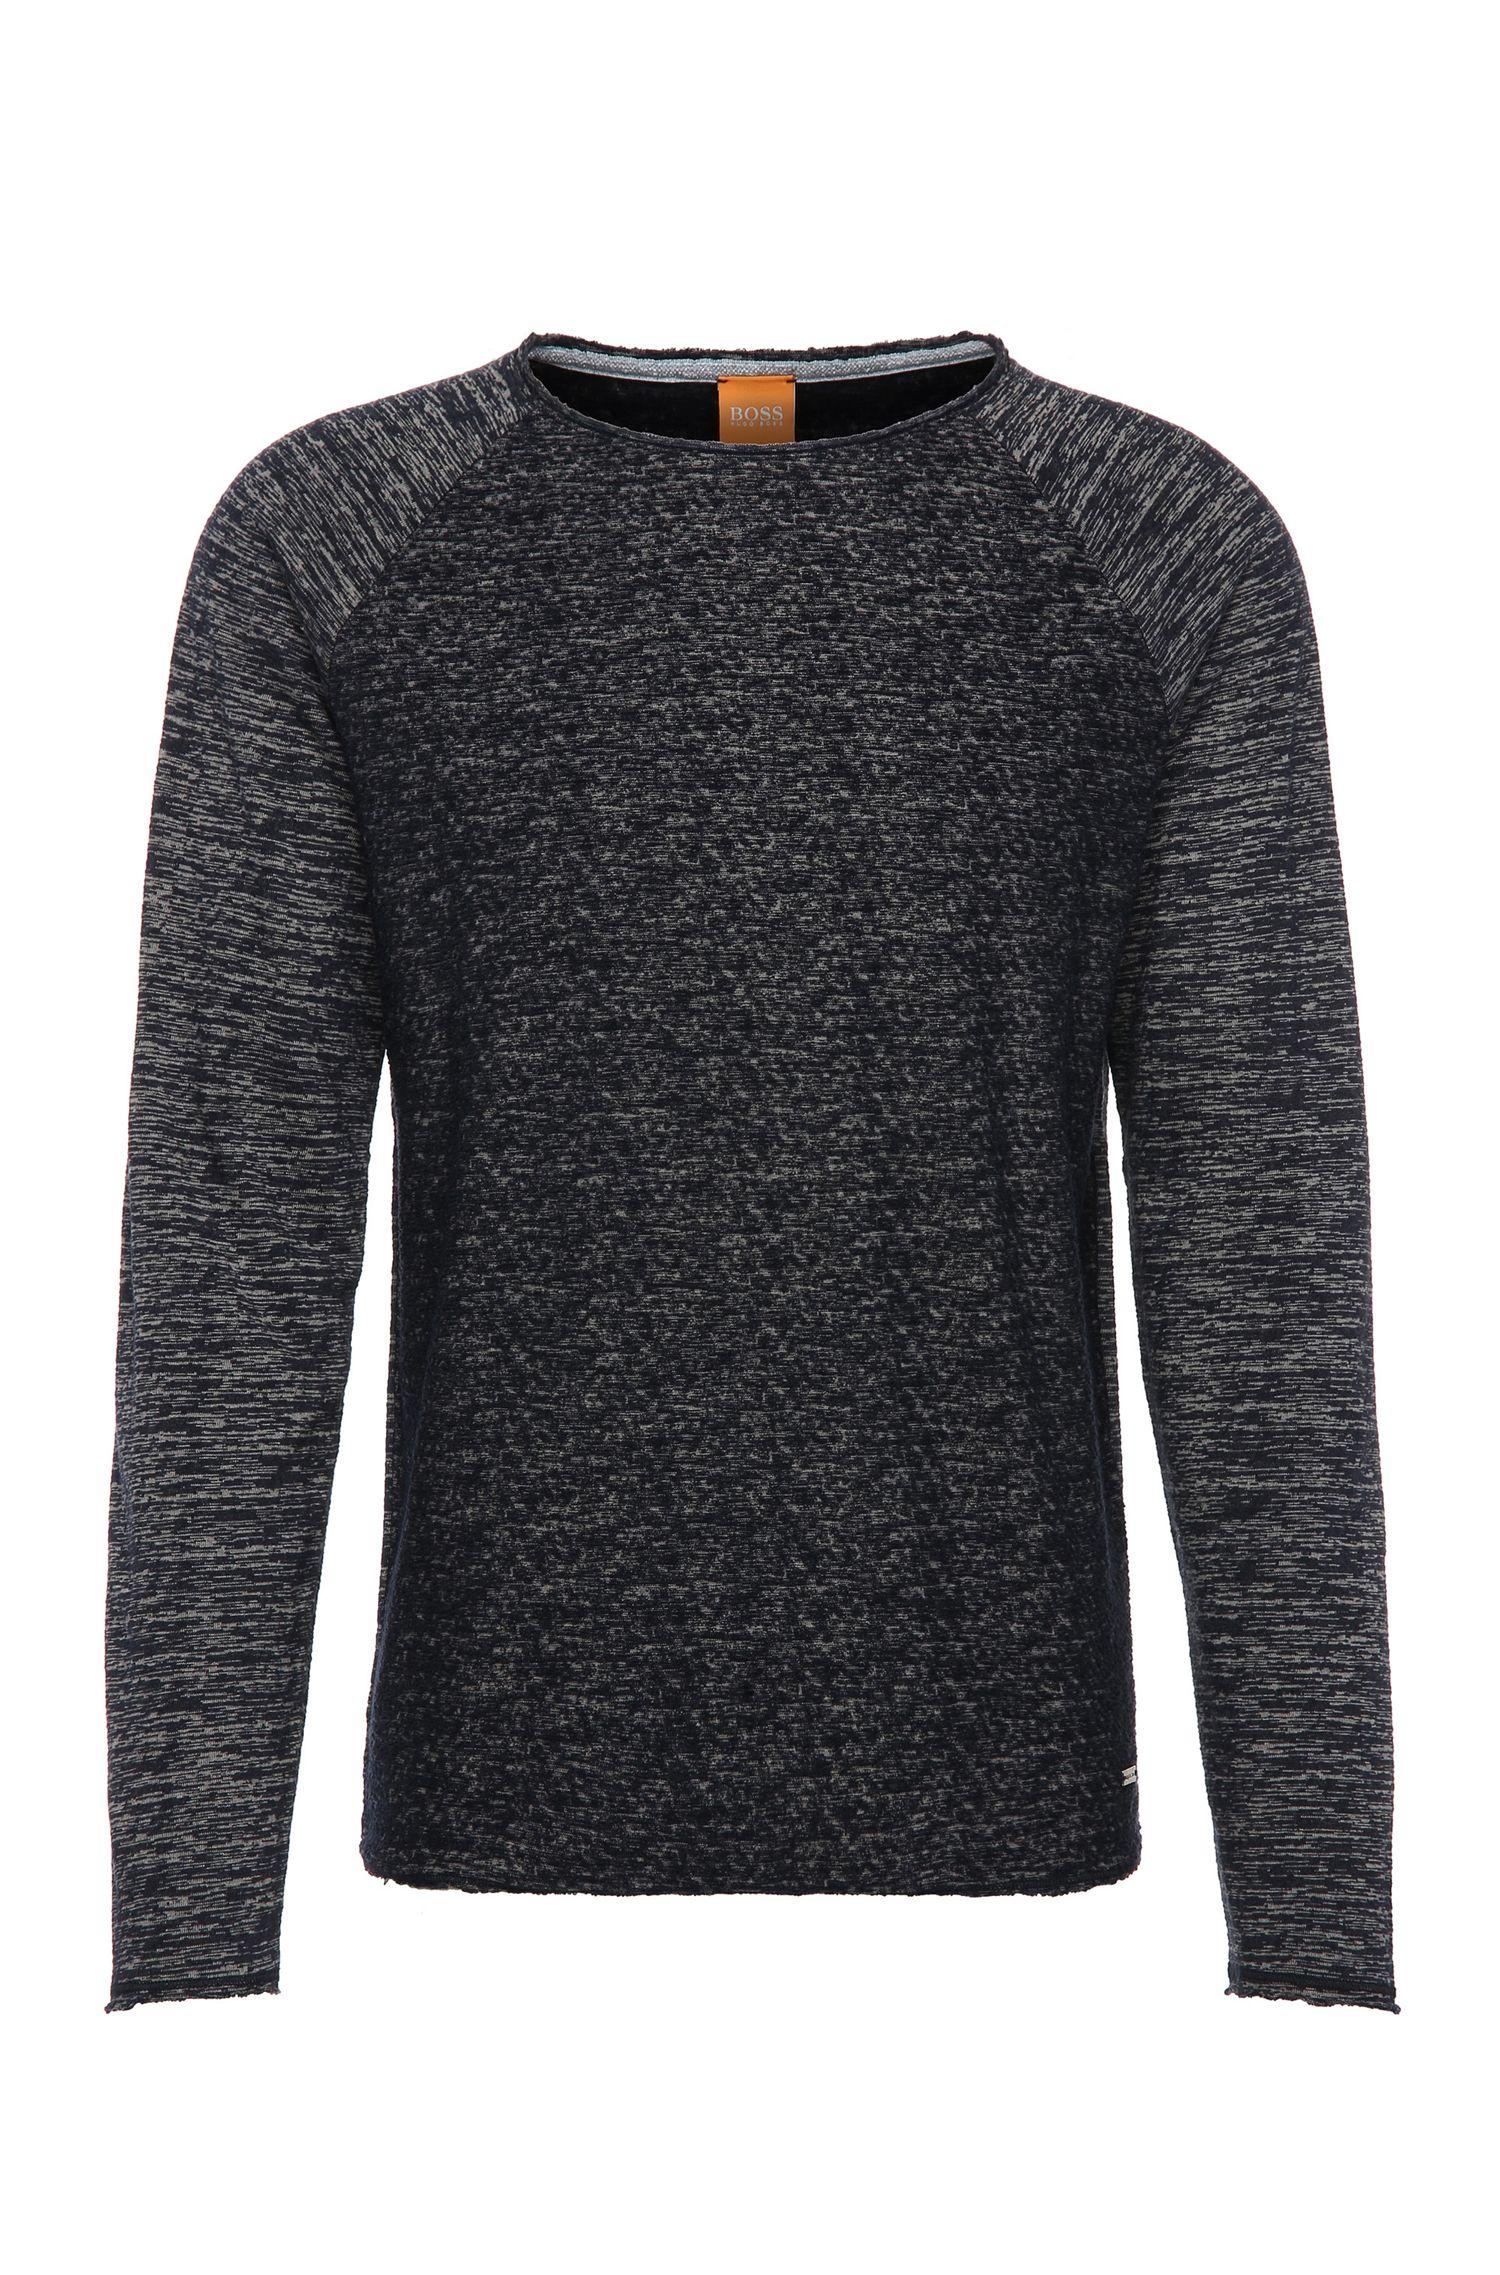 Relaxed-Fit Sweatshirt aus Baumwoll-Mix: ´Welles`